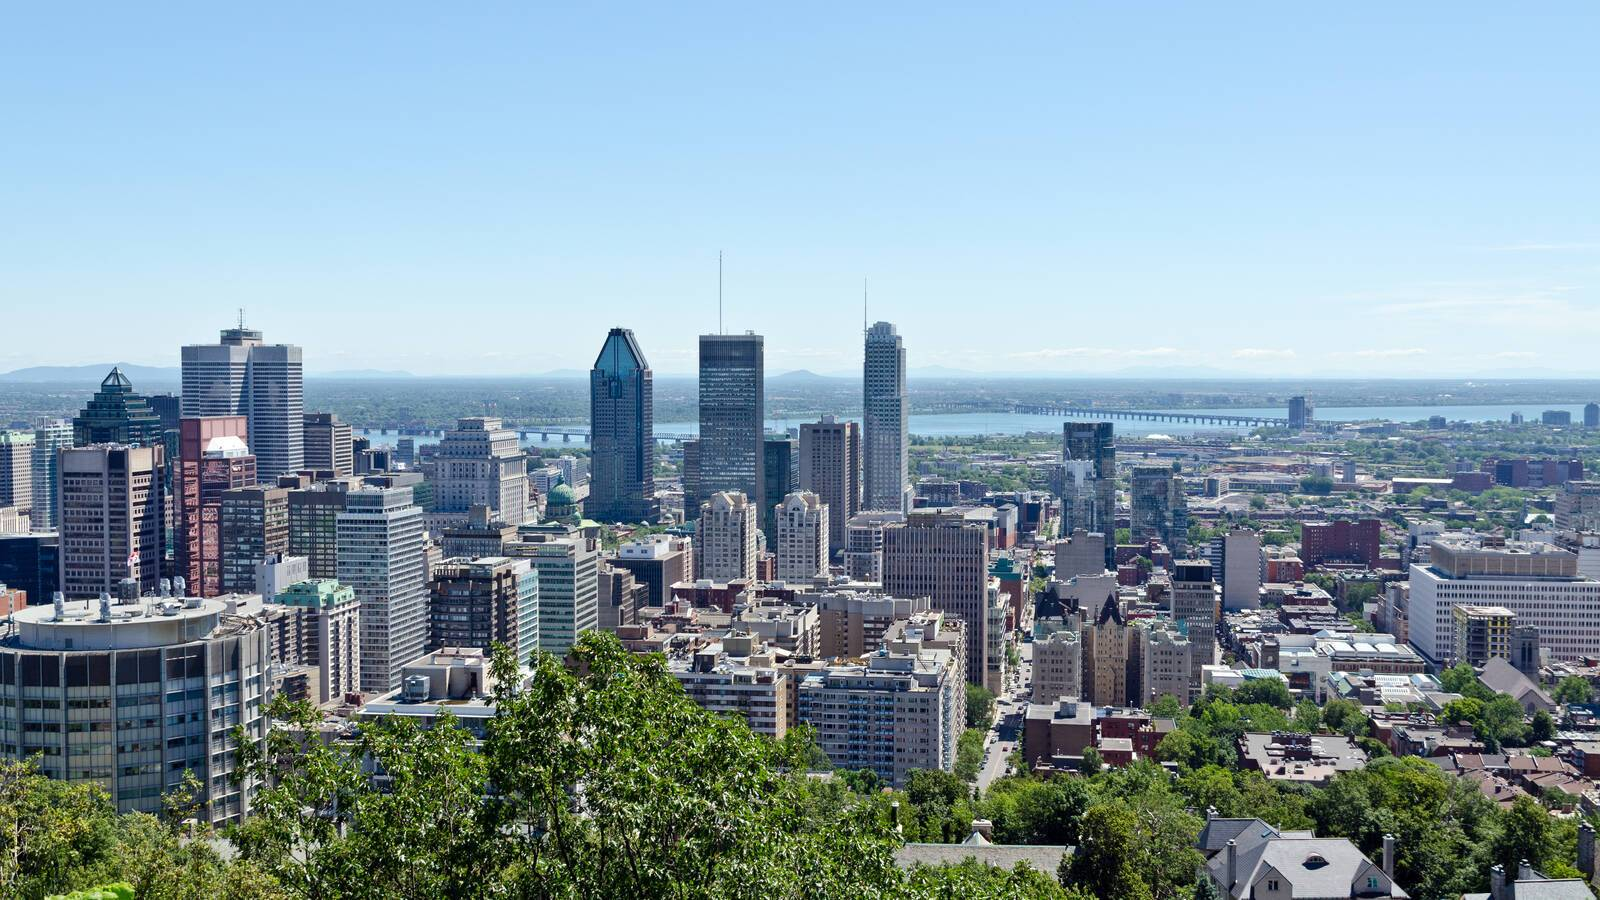 Montreal Ville New York Montreal PavelCheiko